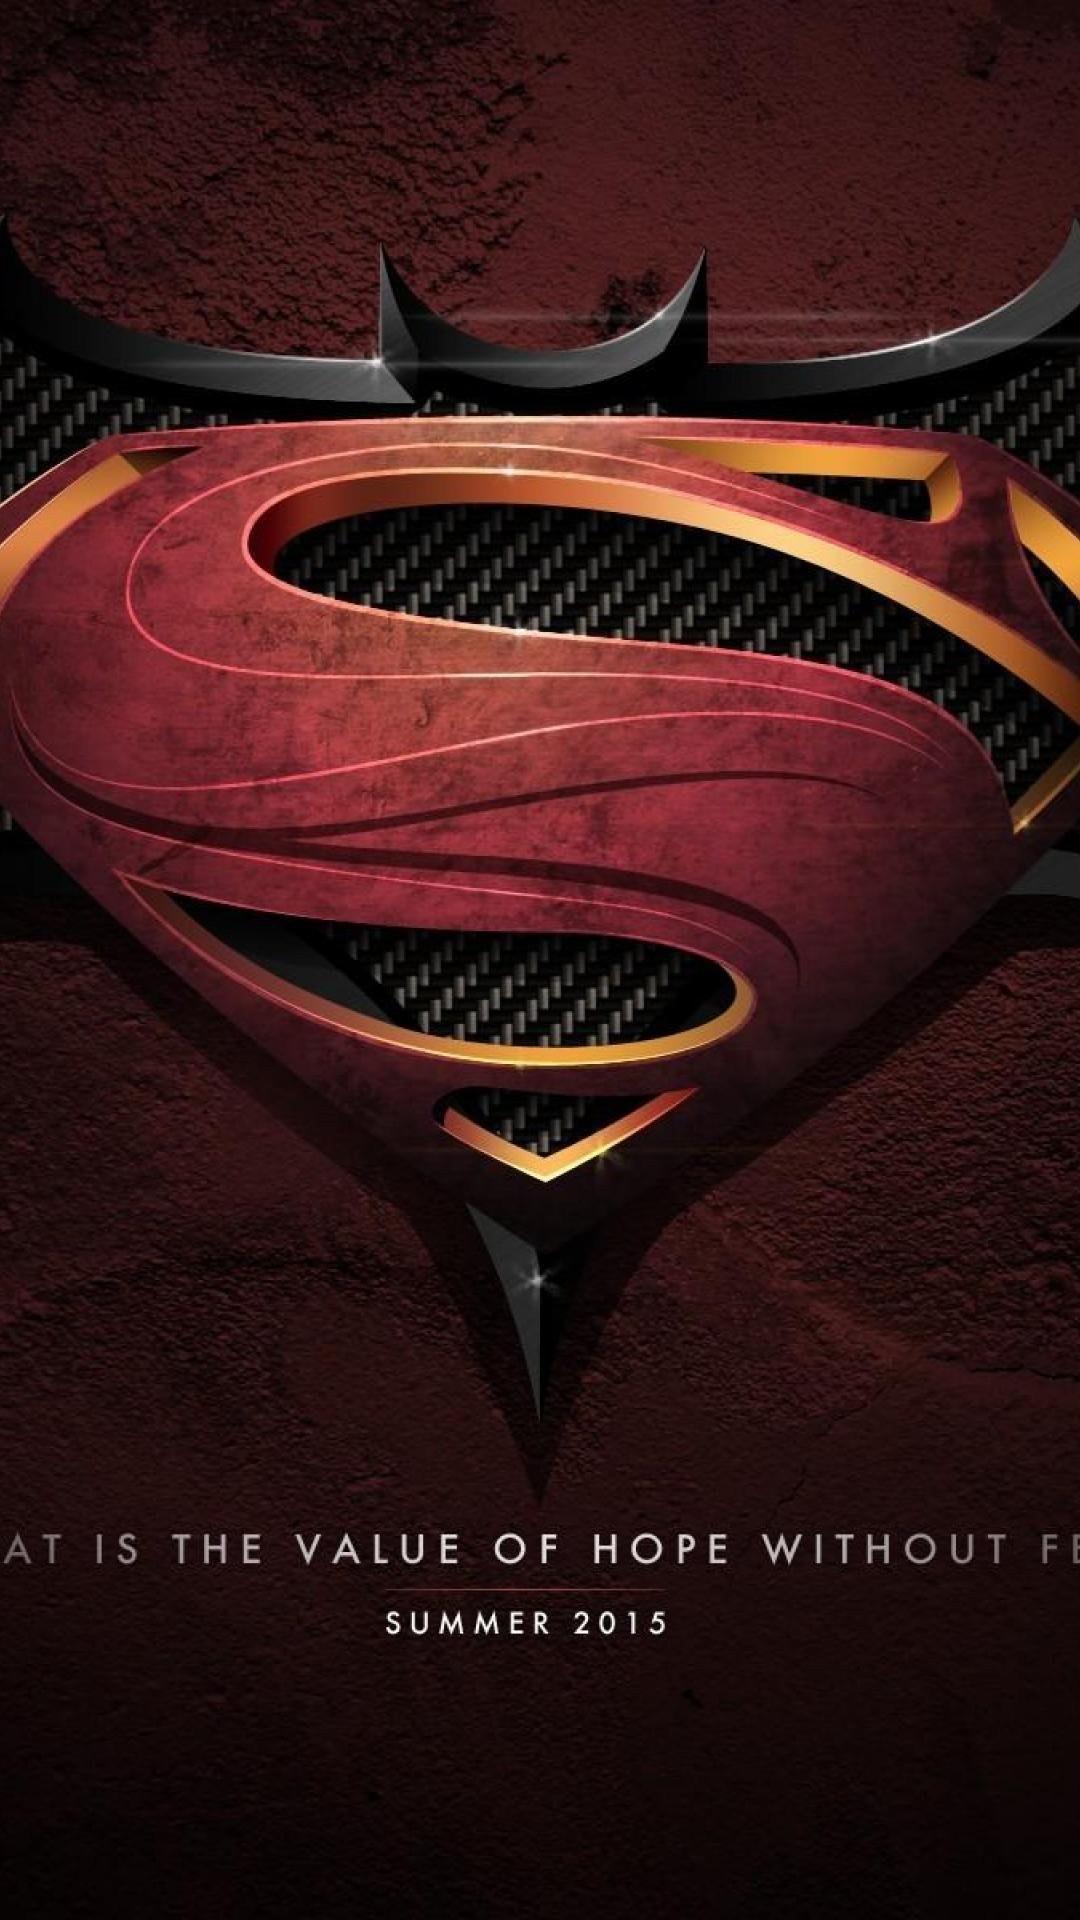 Batman Vs Superman Hd Wallpapers For Iphone 6 Plus Wallpapers